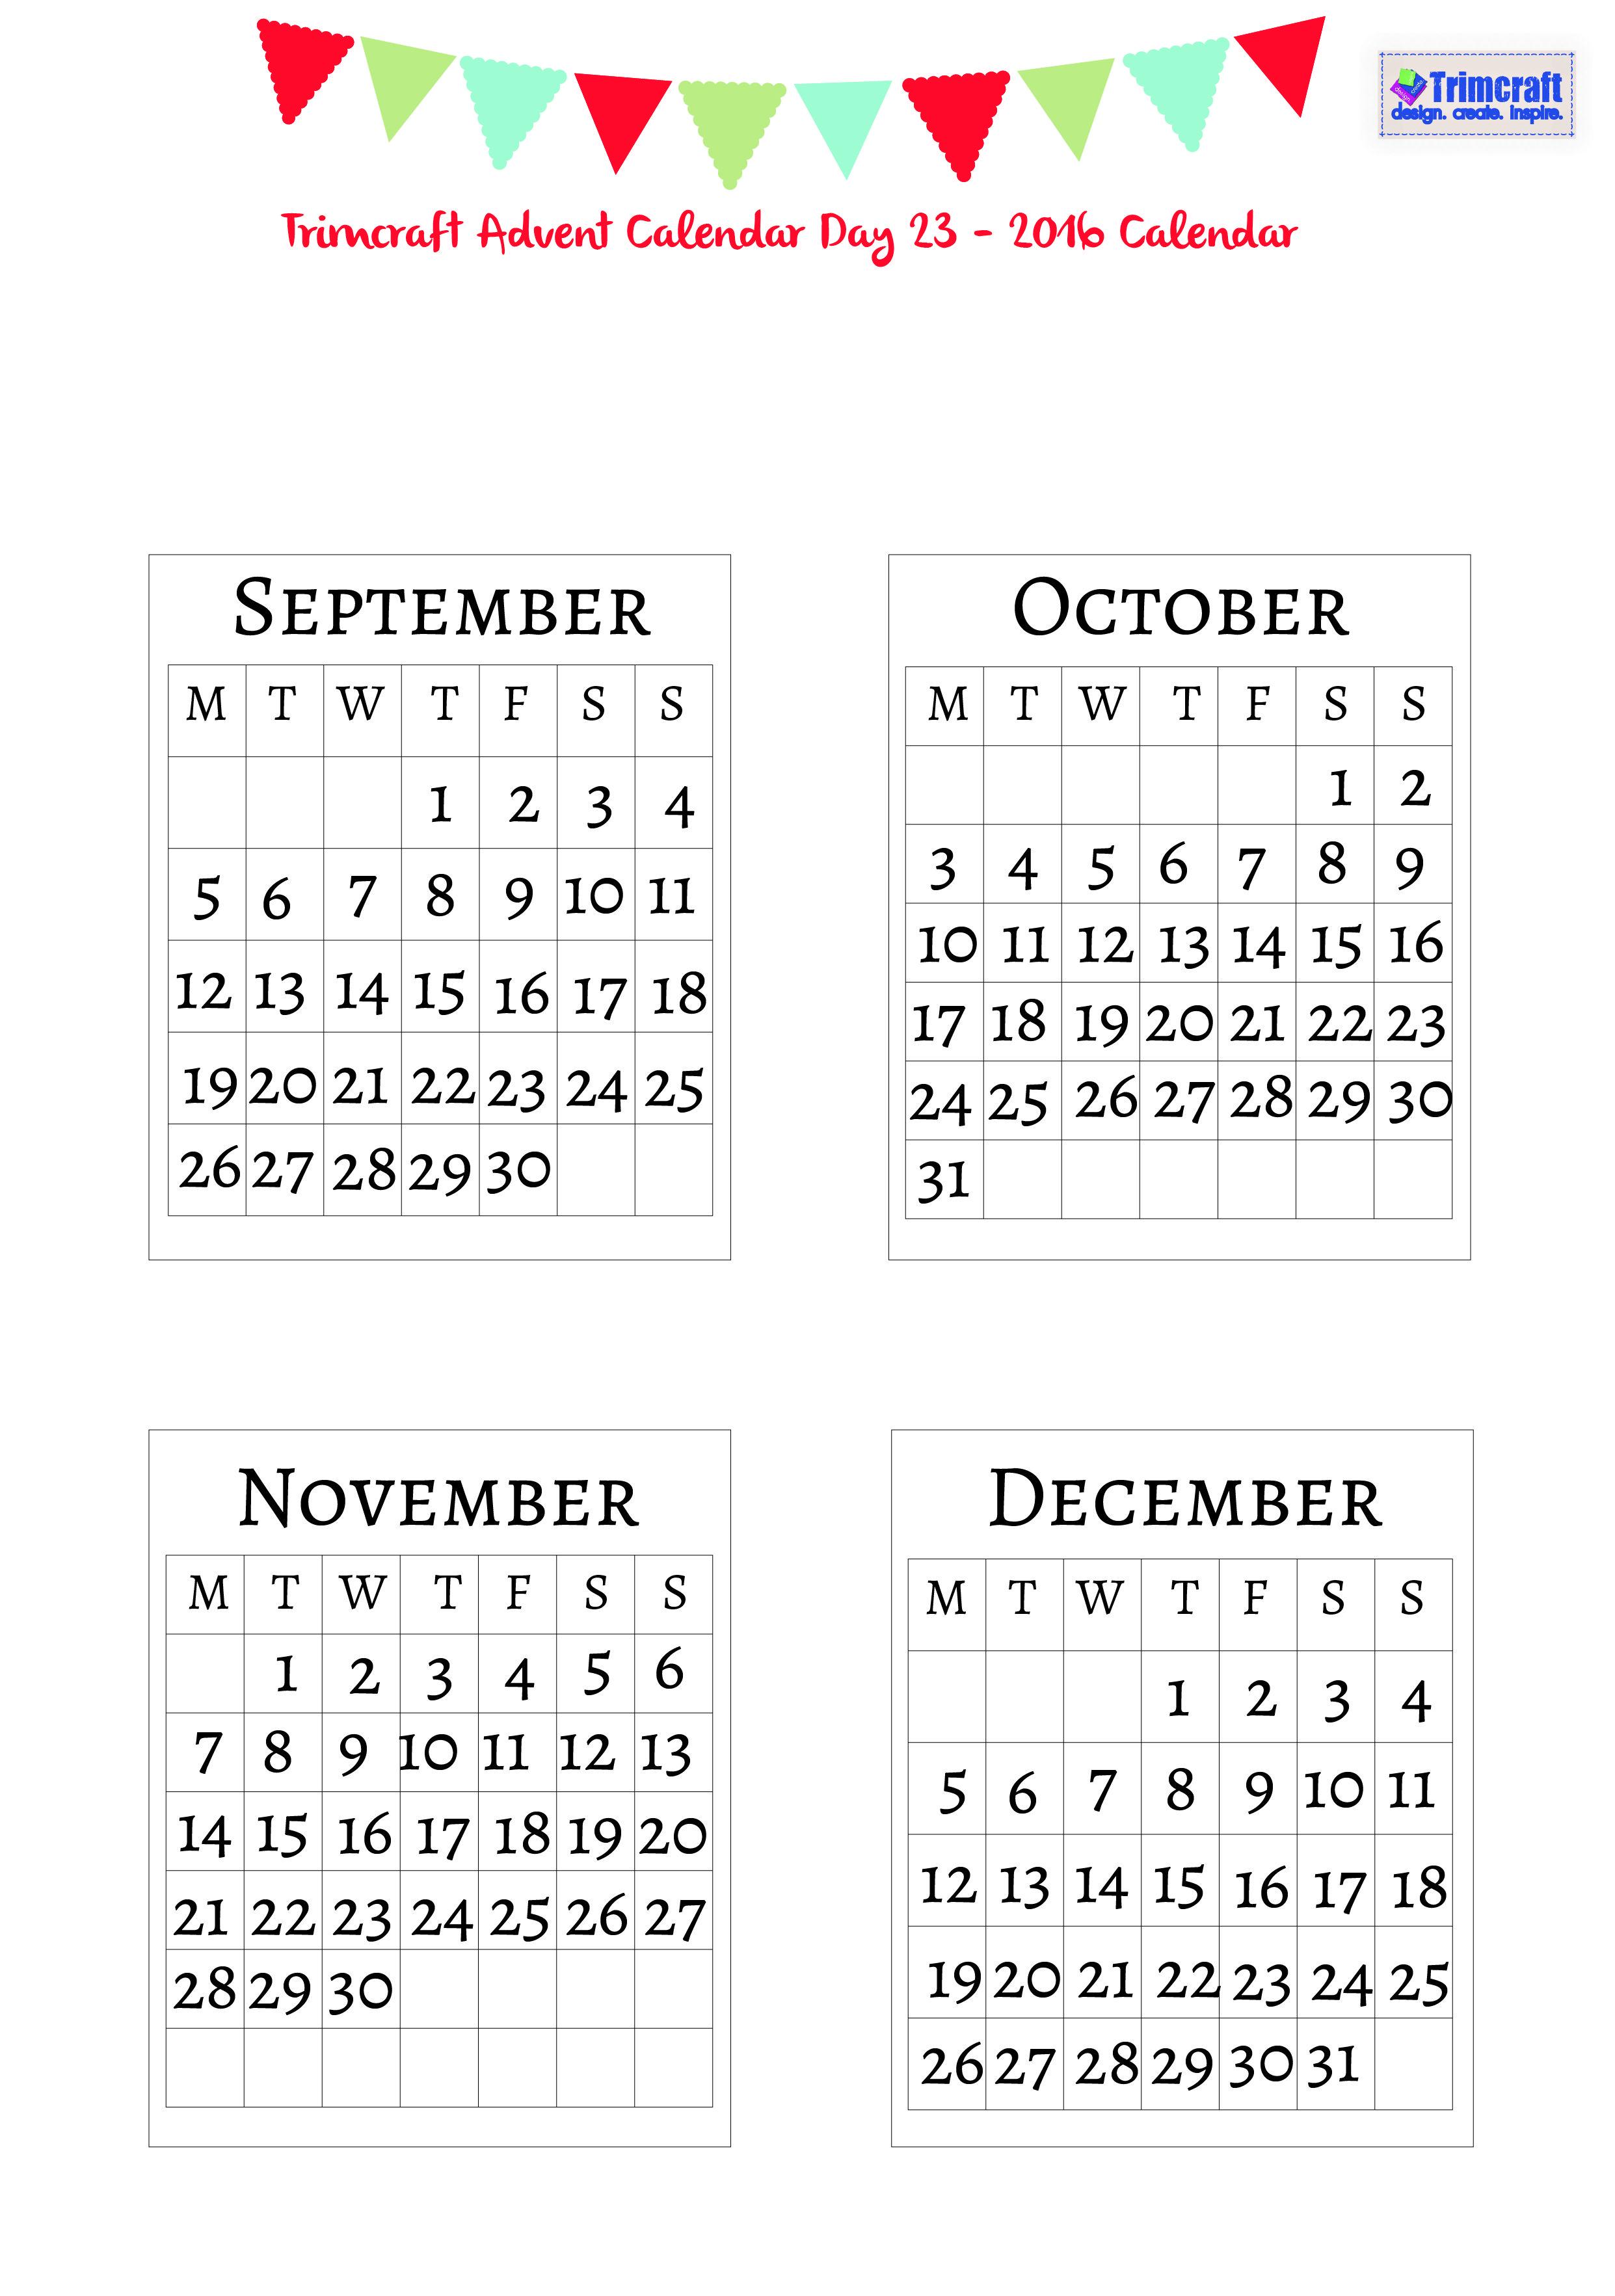 Trimcraft Advent Calendar Day 23 Free 2016 Calendar Template